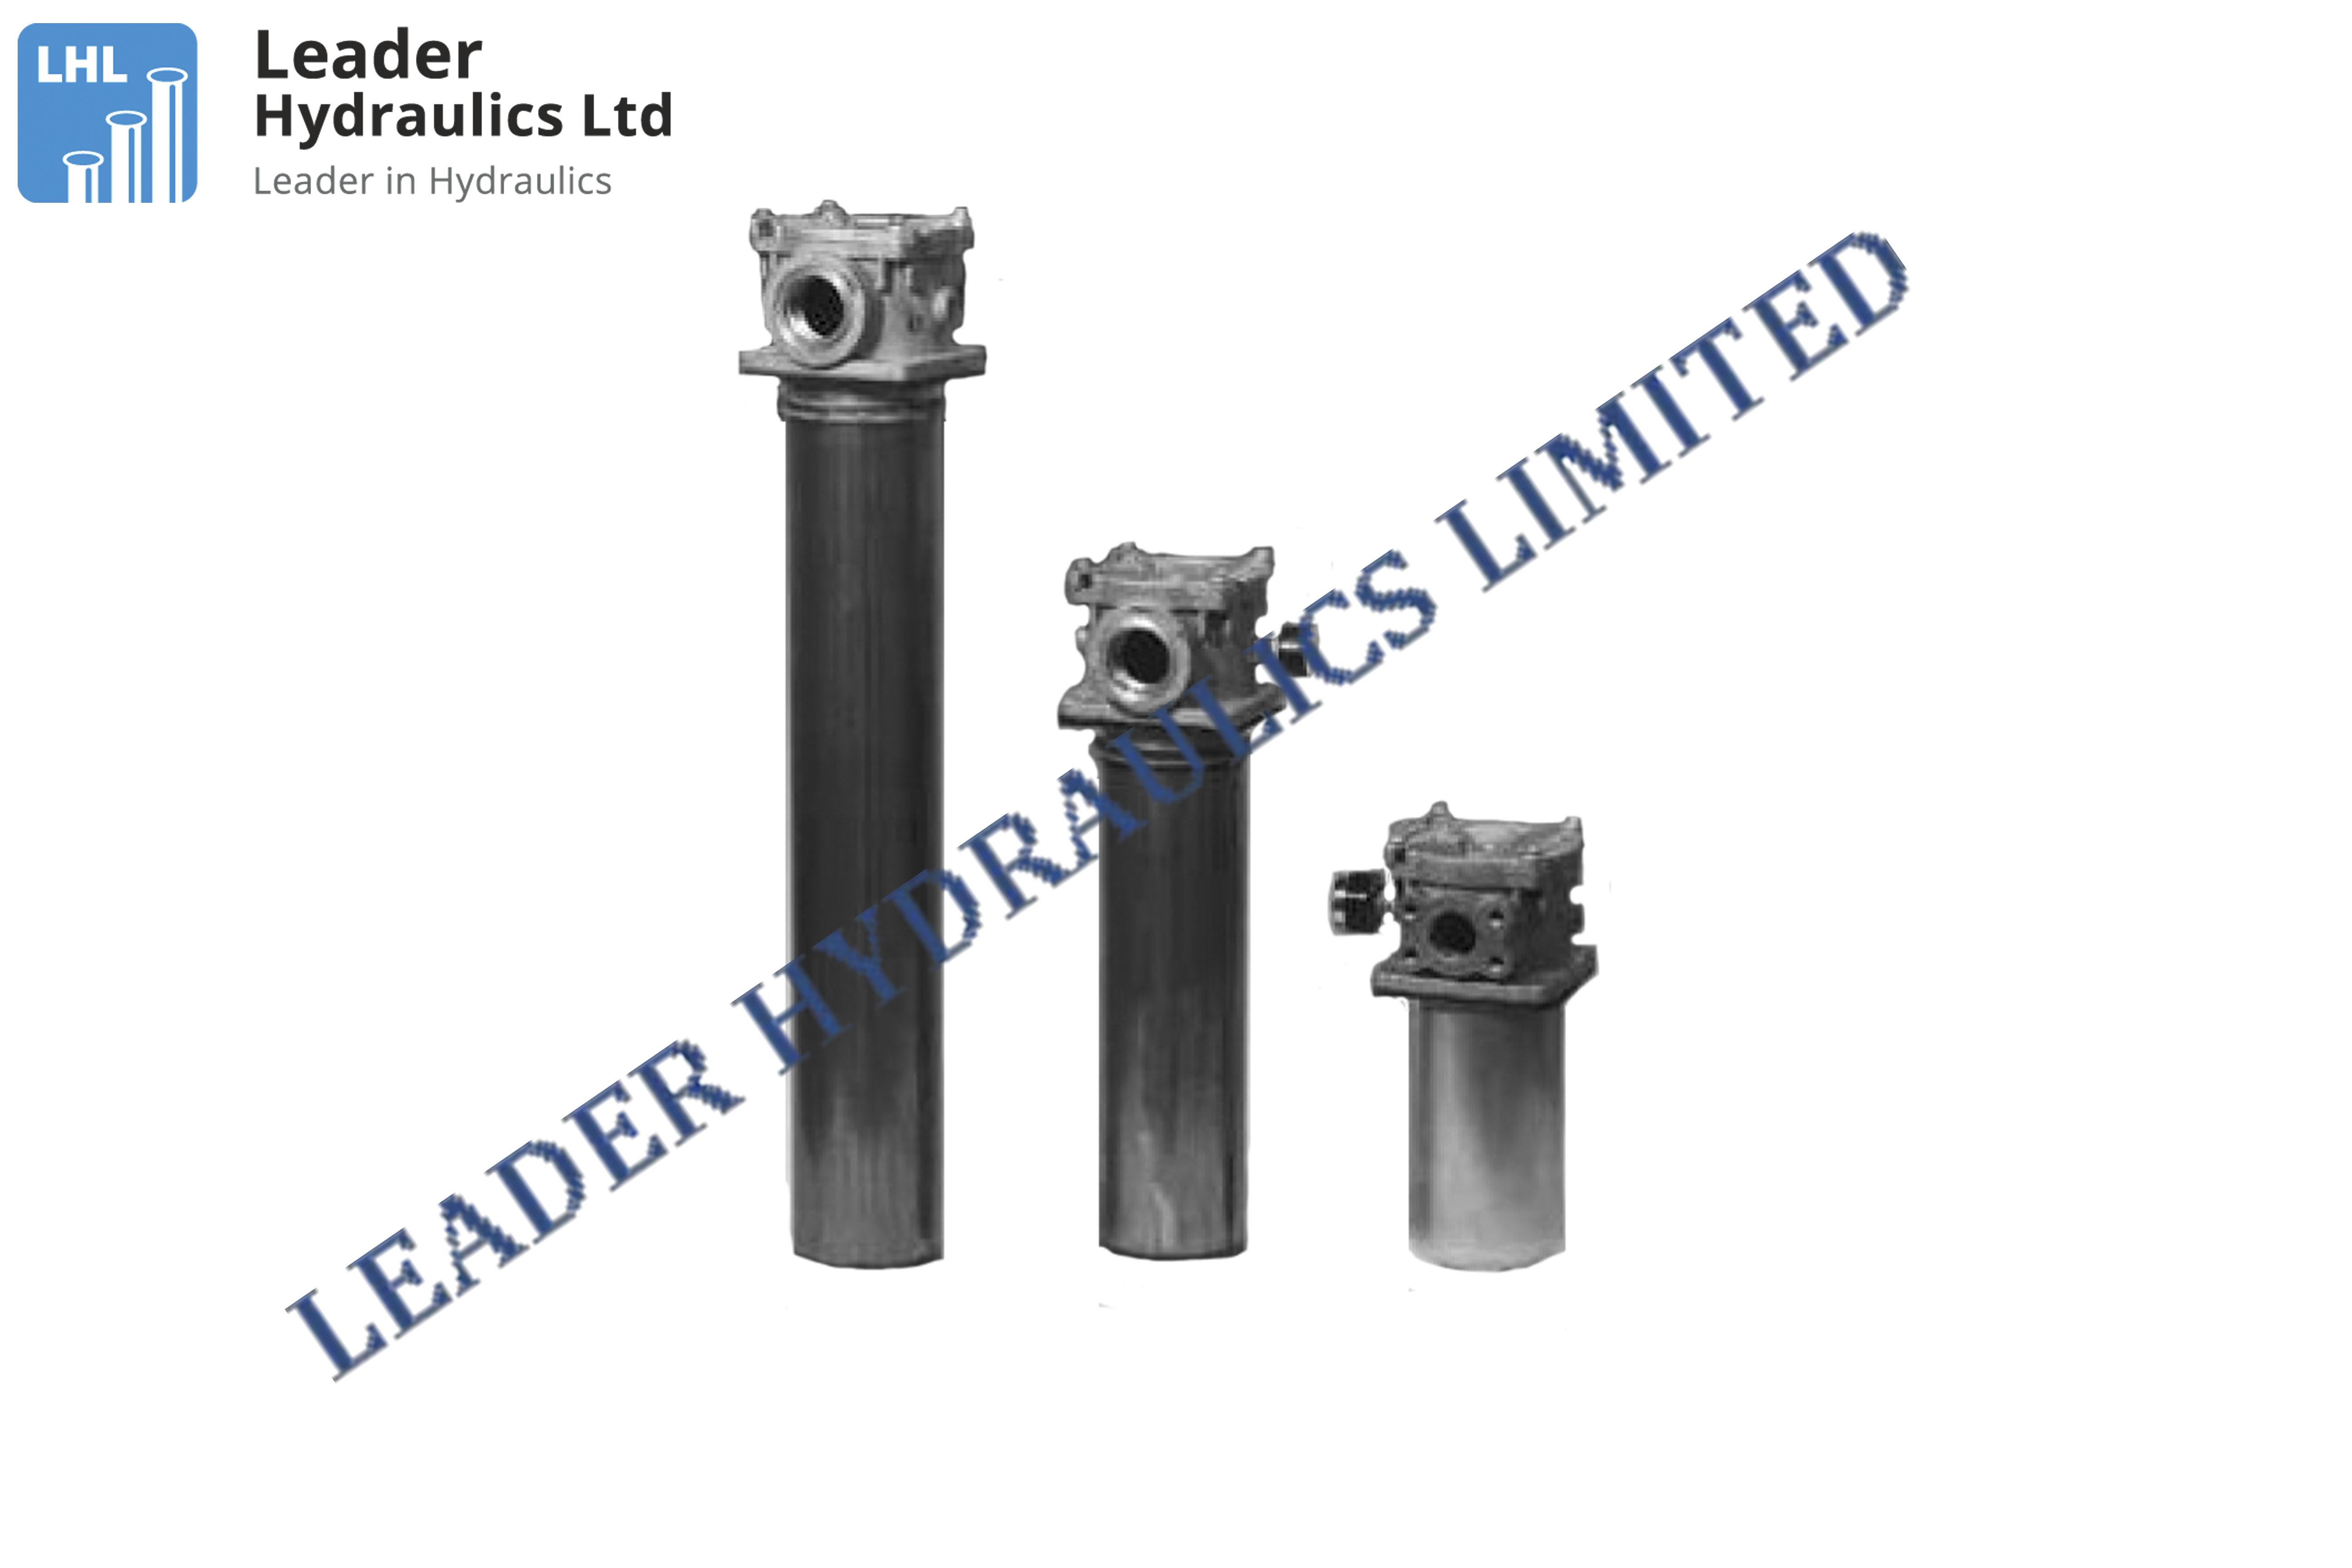 Return Line Filter Hf4r Leader Hydraulics